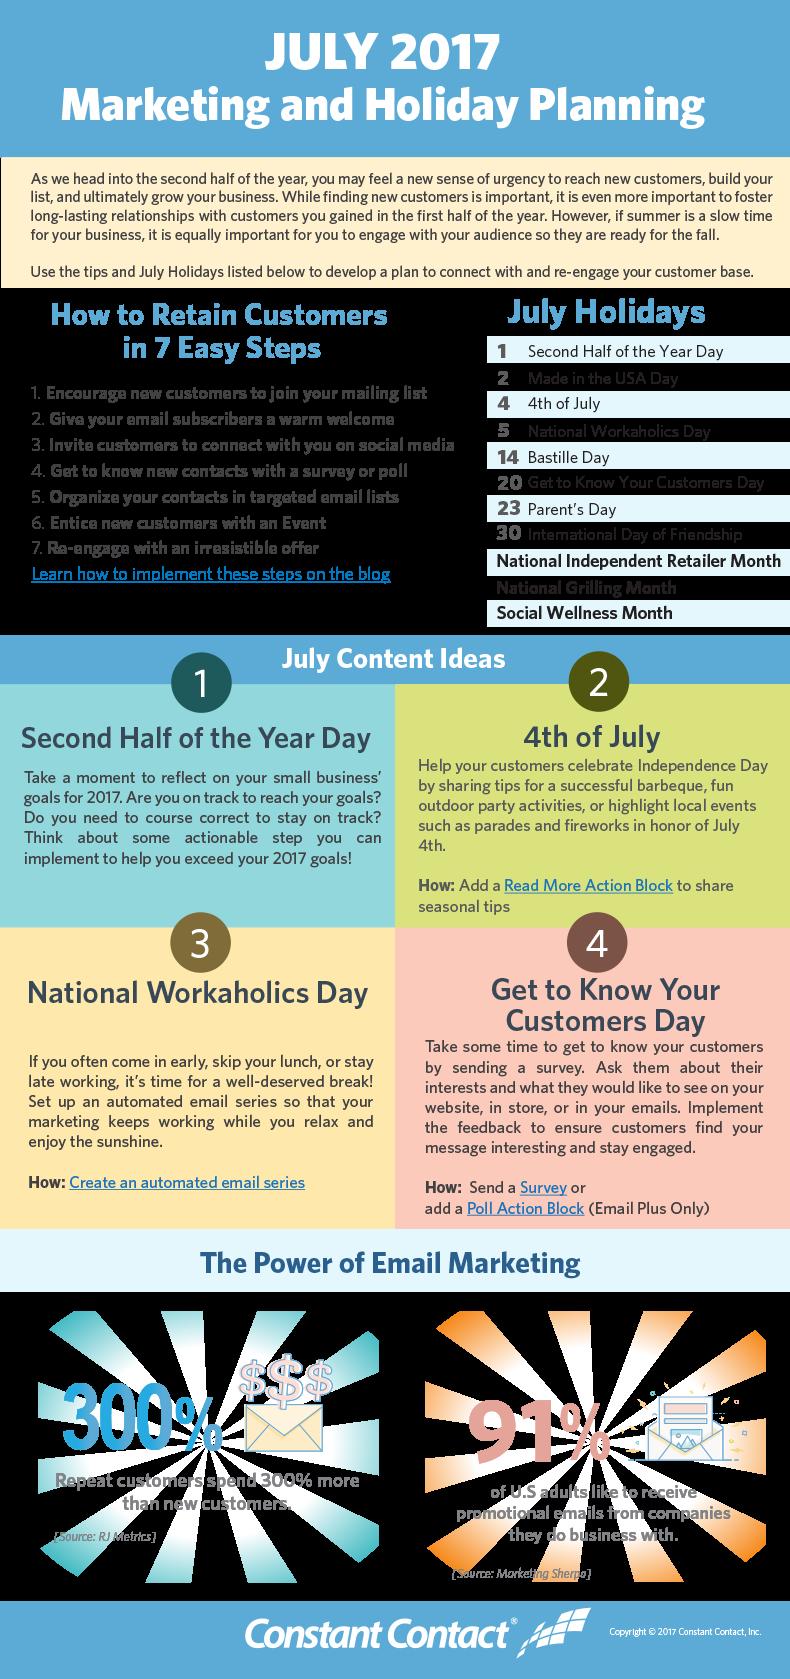 July 2019 Marketing and Holiday Planning Marketing